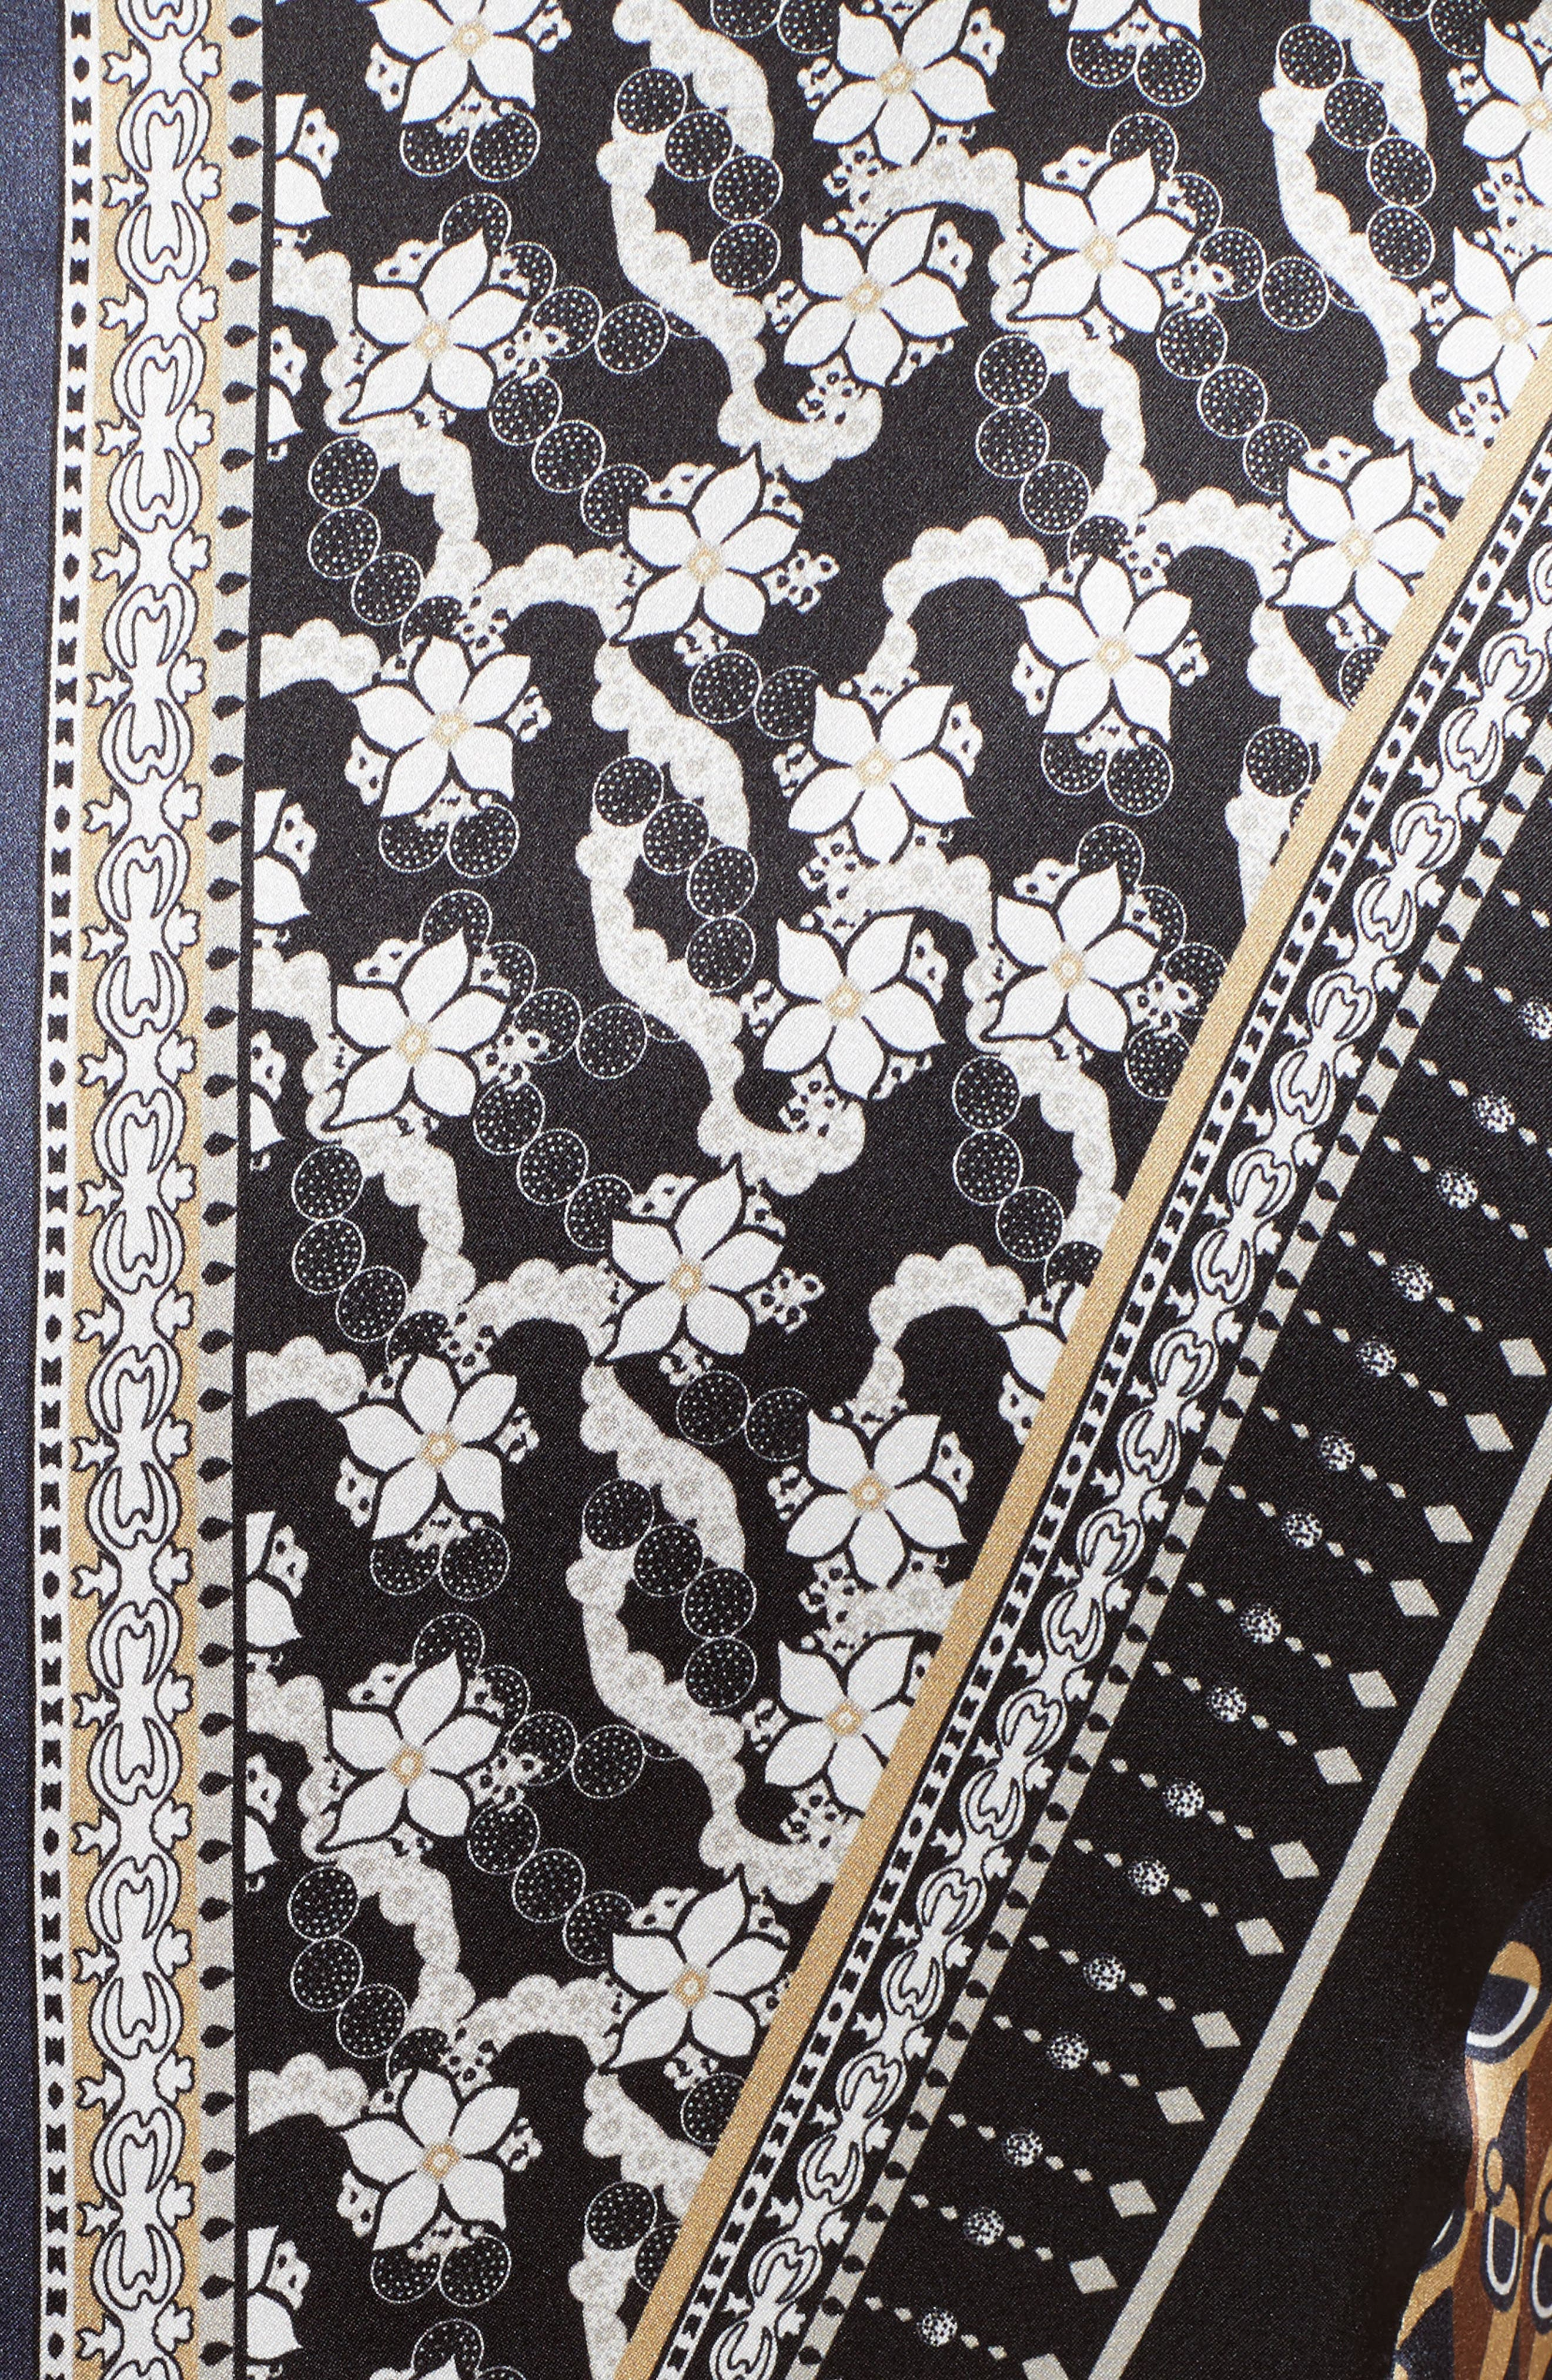 Sebella Silk Midi Dress,                             Alternate thumbnail 6, color,                             200